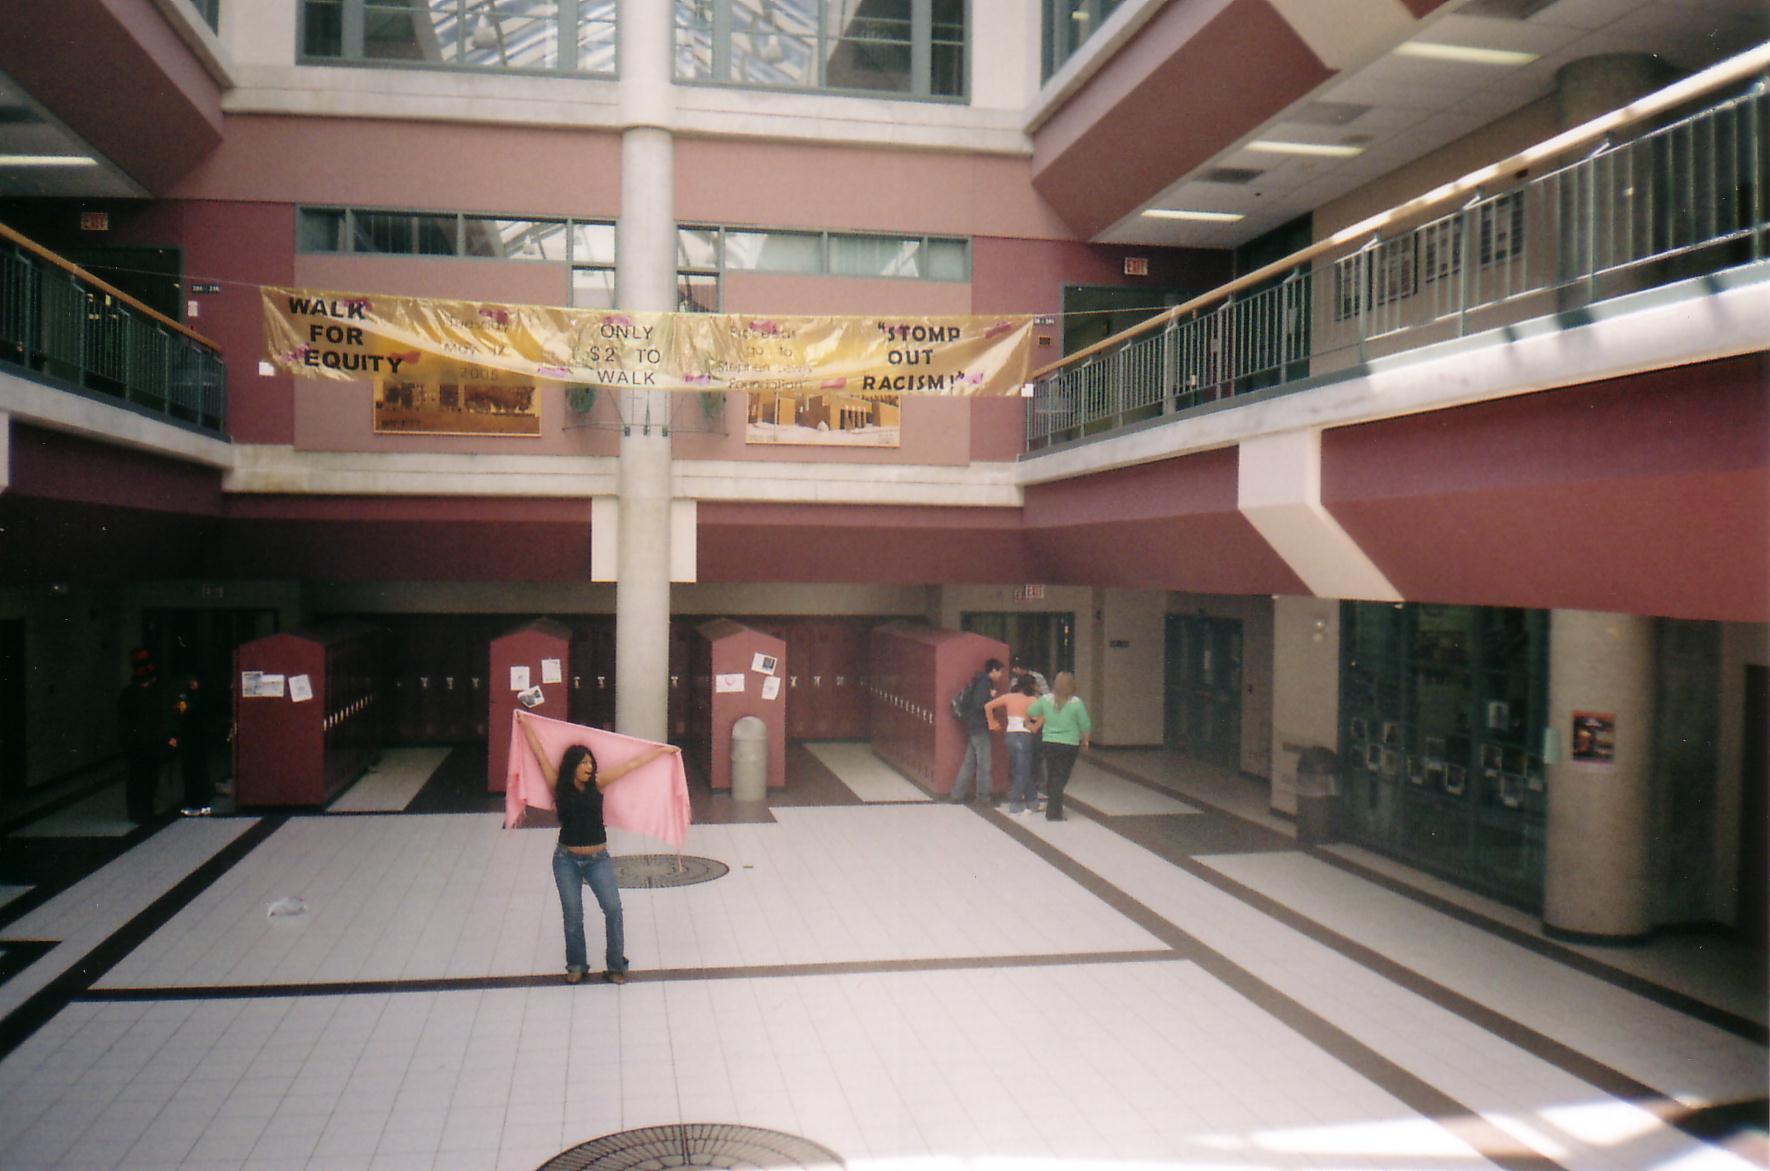 FileAtrium of Newmarket High Schooljpg  Wikimedia Commons